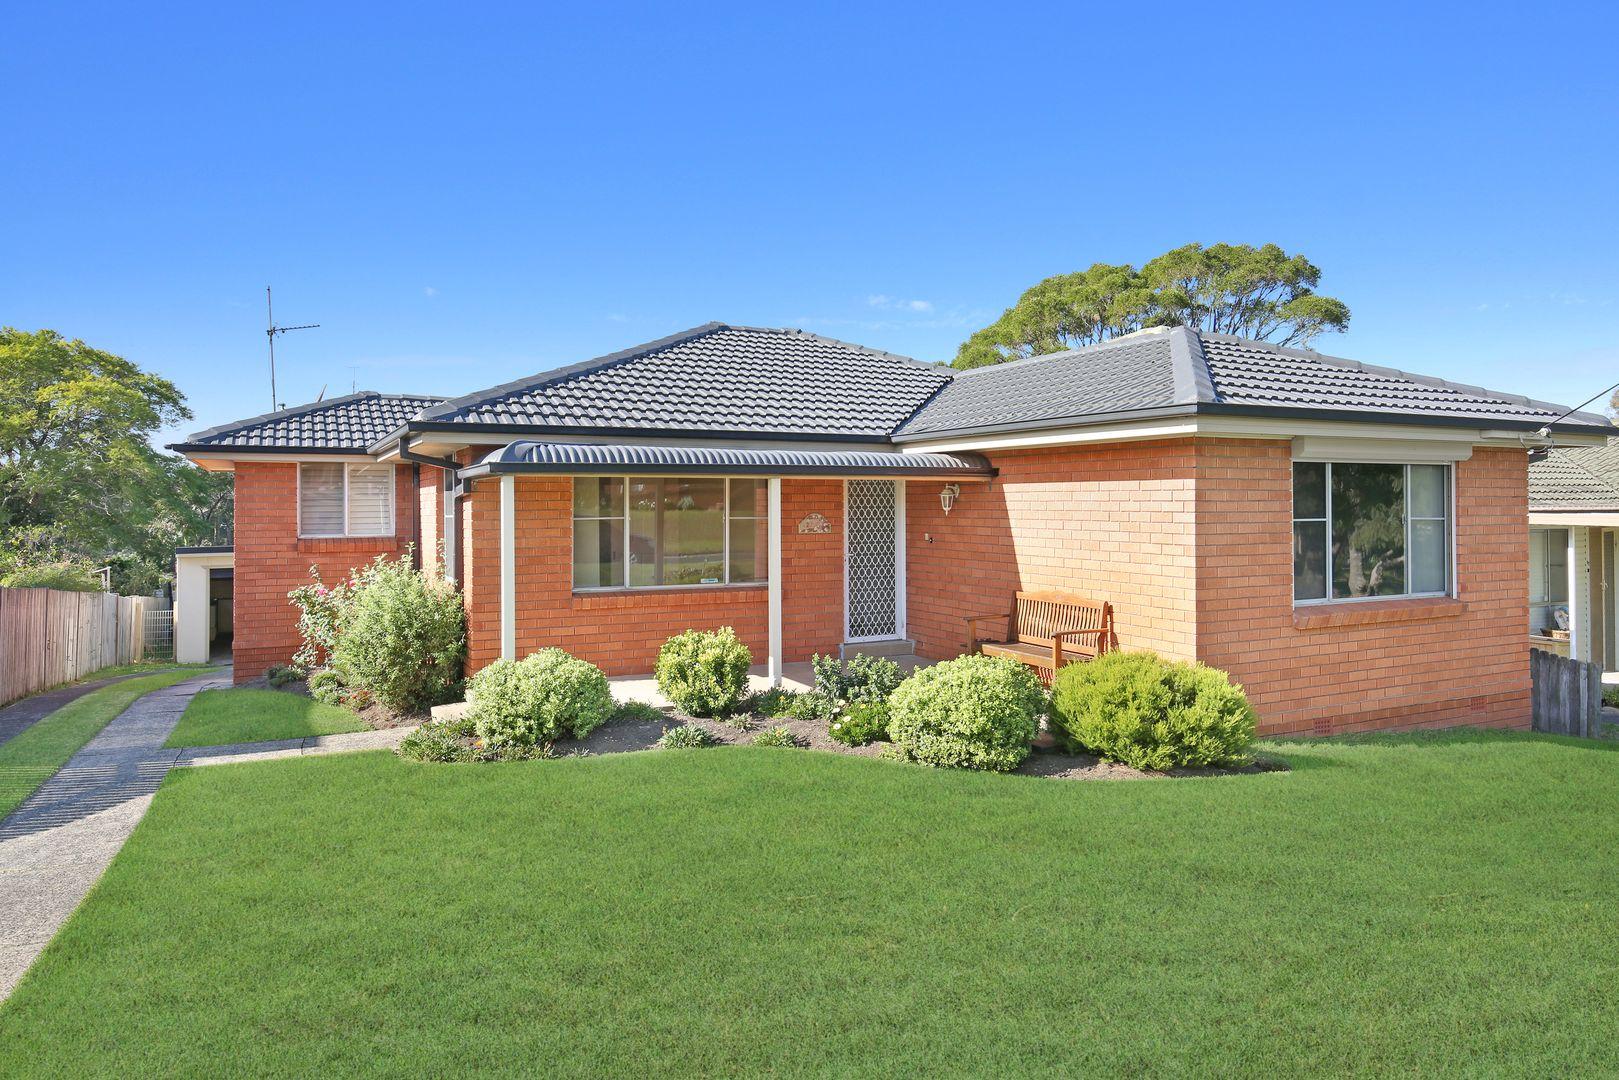 25 Burke  Road, Dapto NSW 2530, Image 0